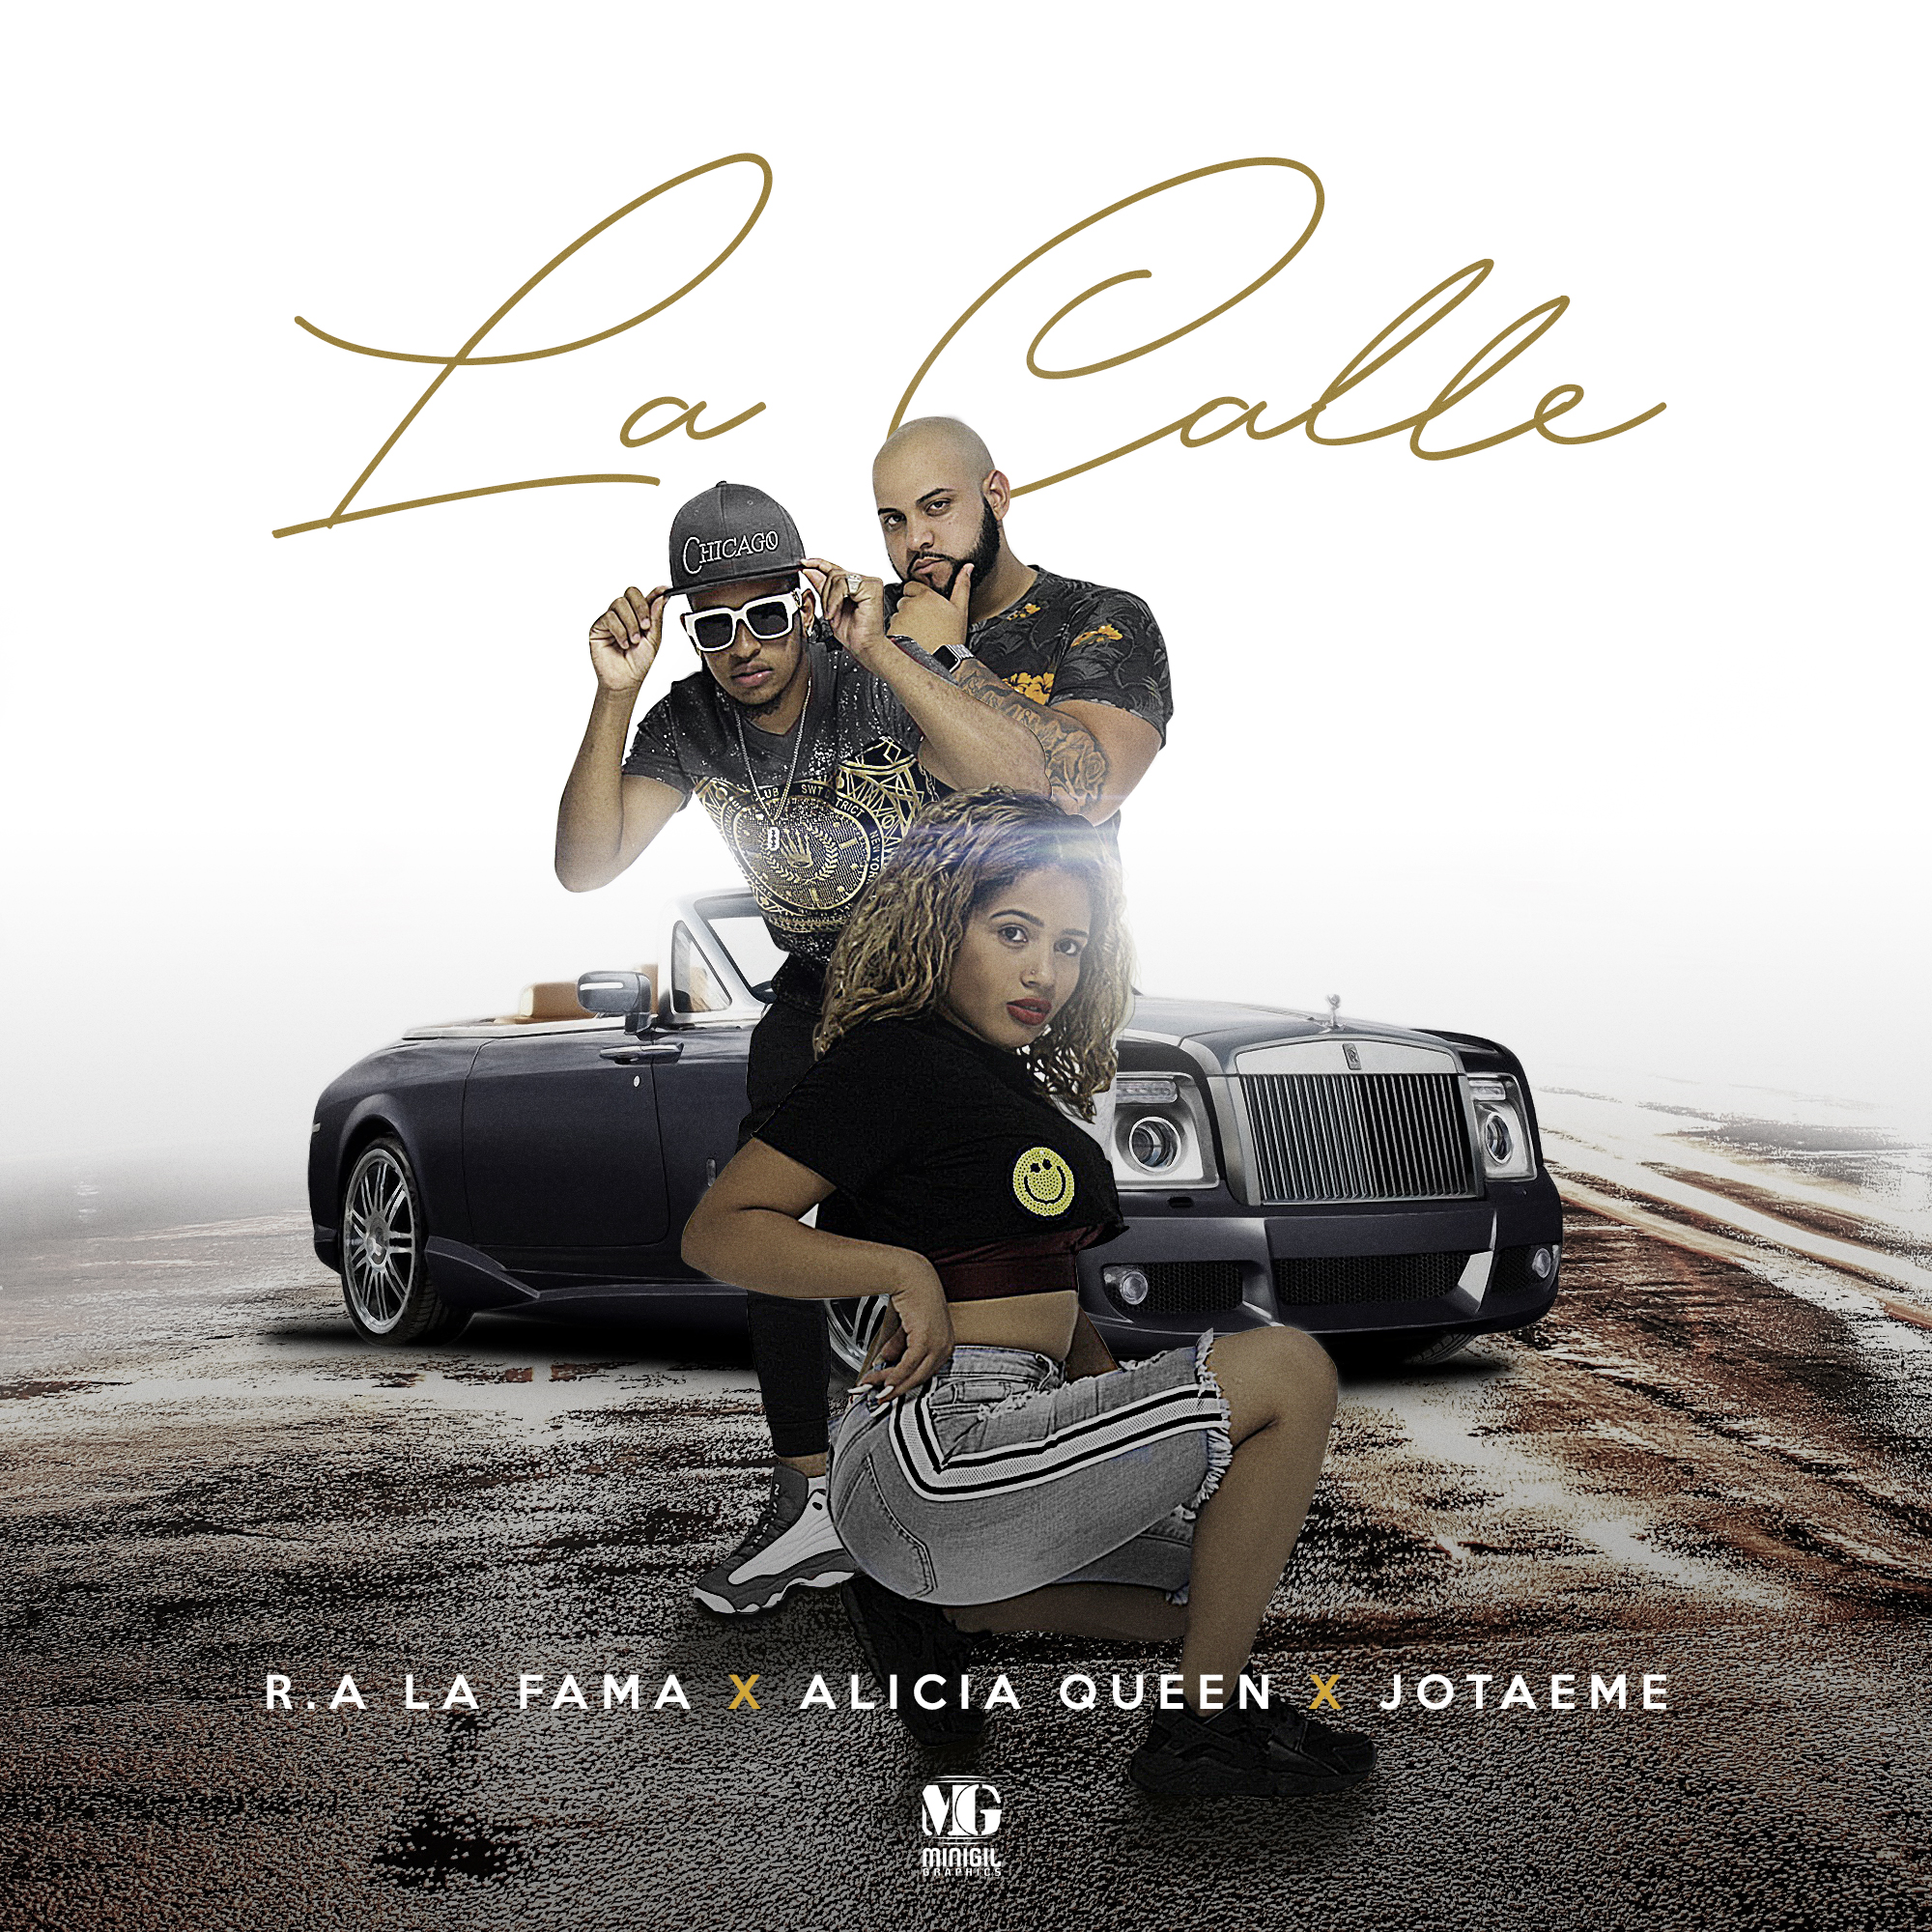 LA CALLE TOPCLASS